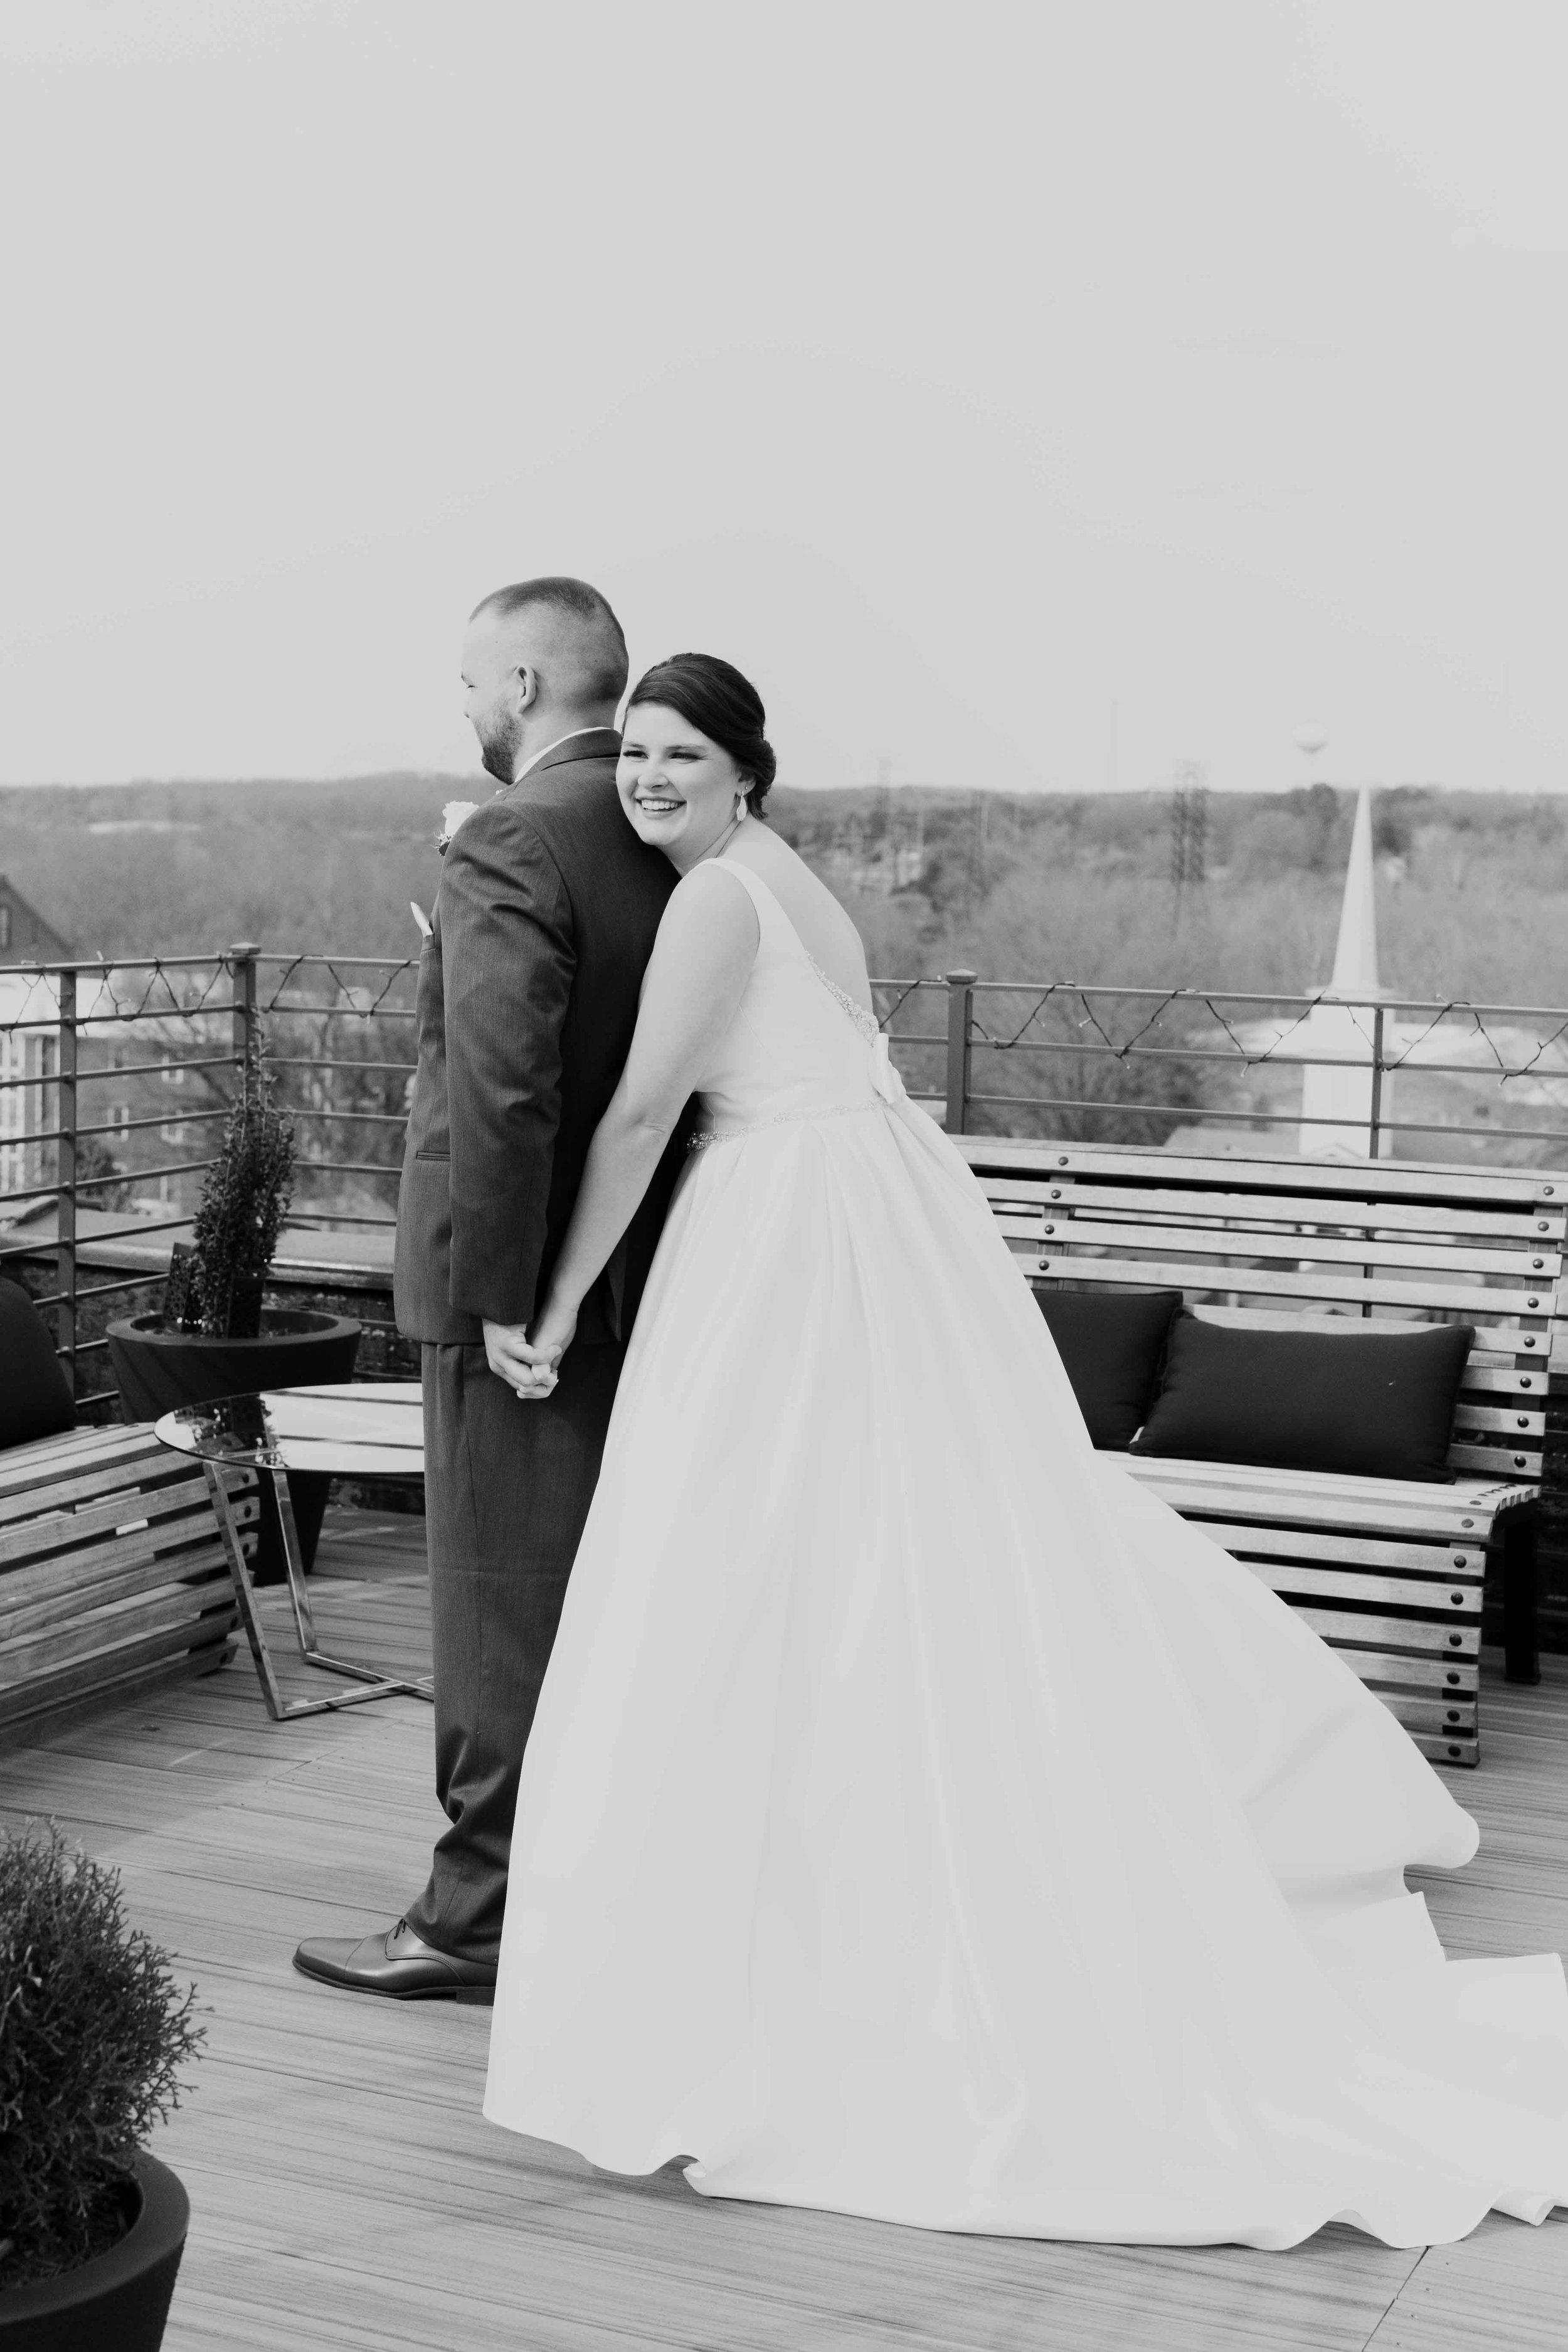 Farmville-Virginia-Wedding-Hotel-Weynoke-Downtown-Jacqueline-Waters-Photography-Detailed- (471).jpg